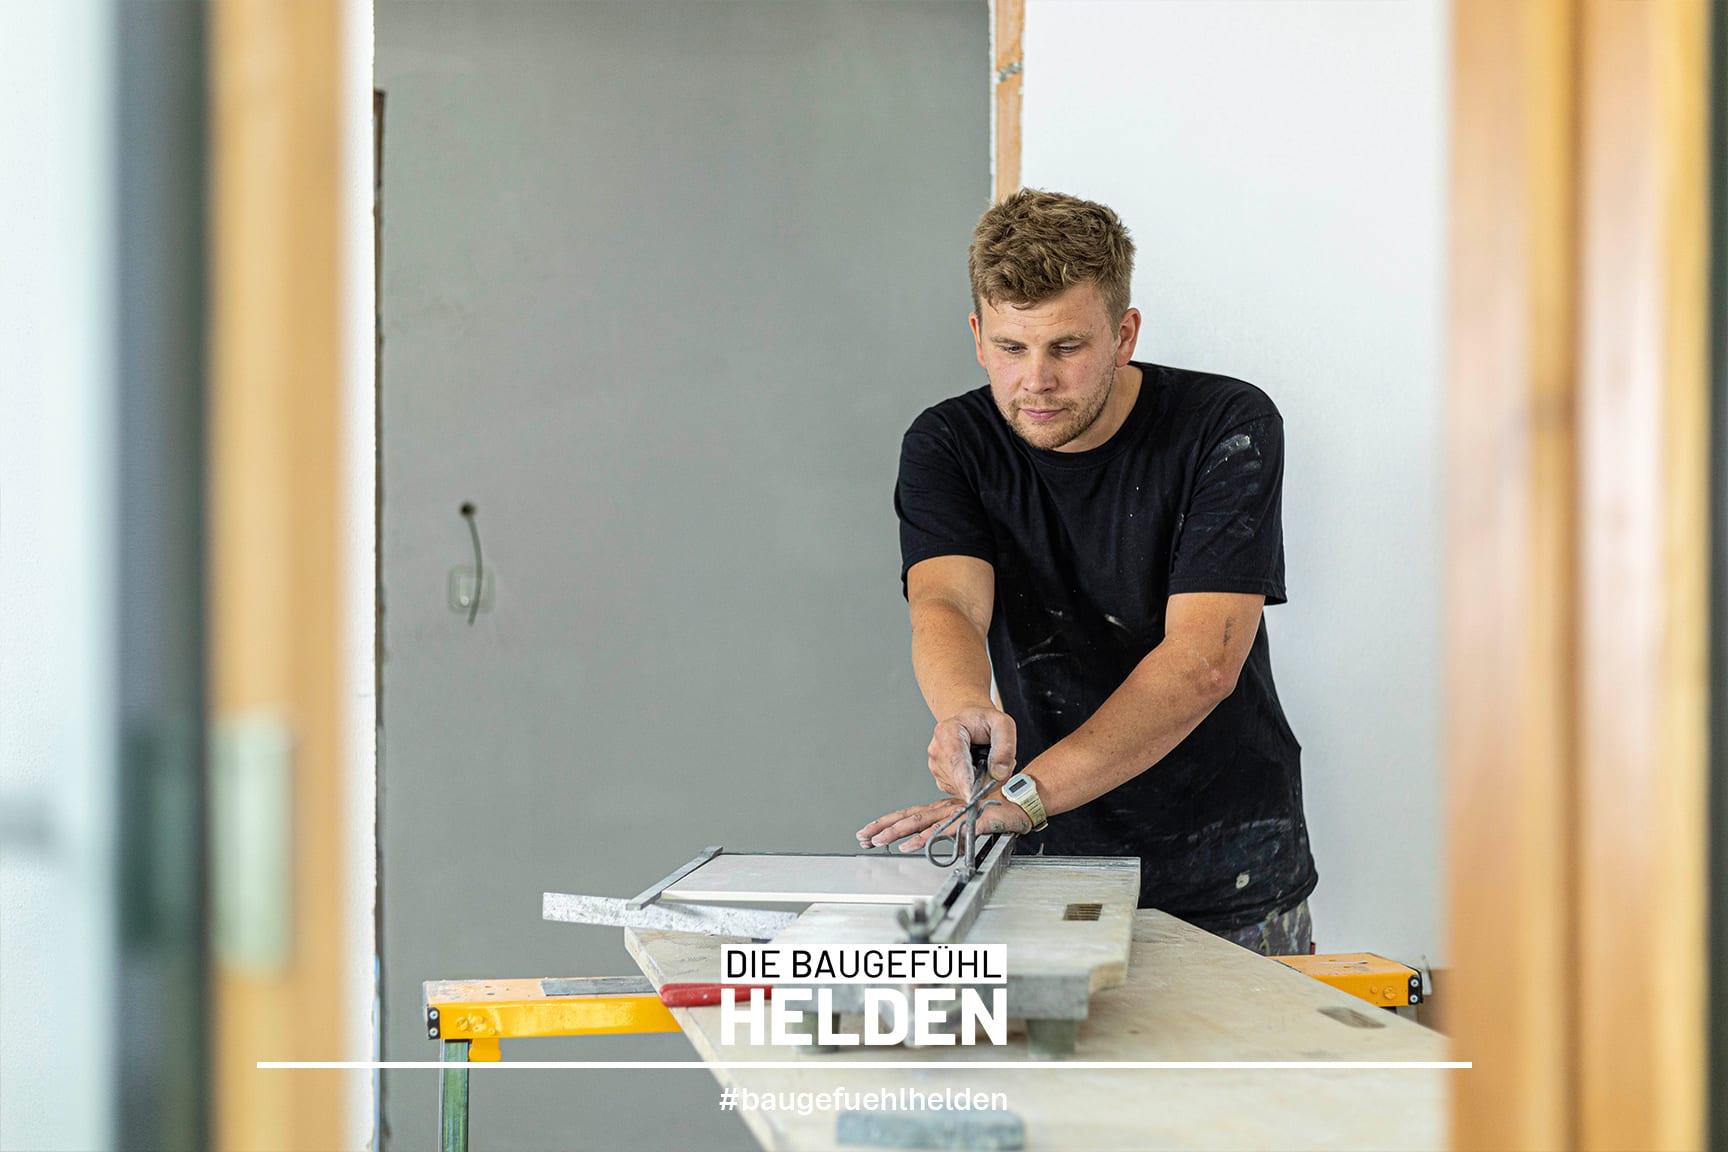 Galerie_Baugefuehlhelden_Fliesen.jpg